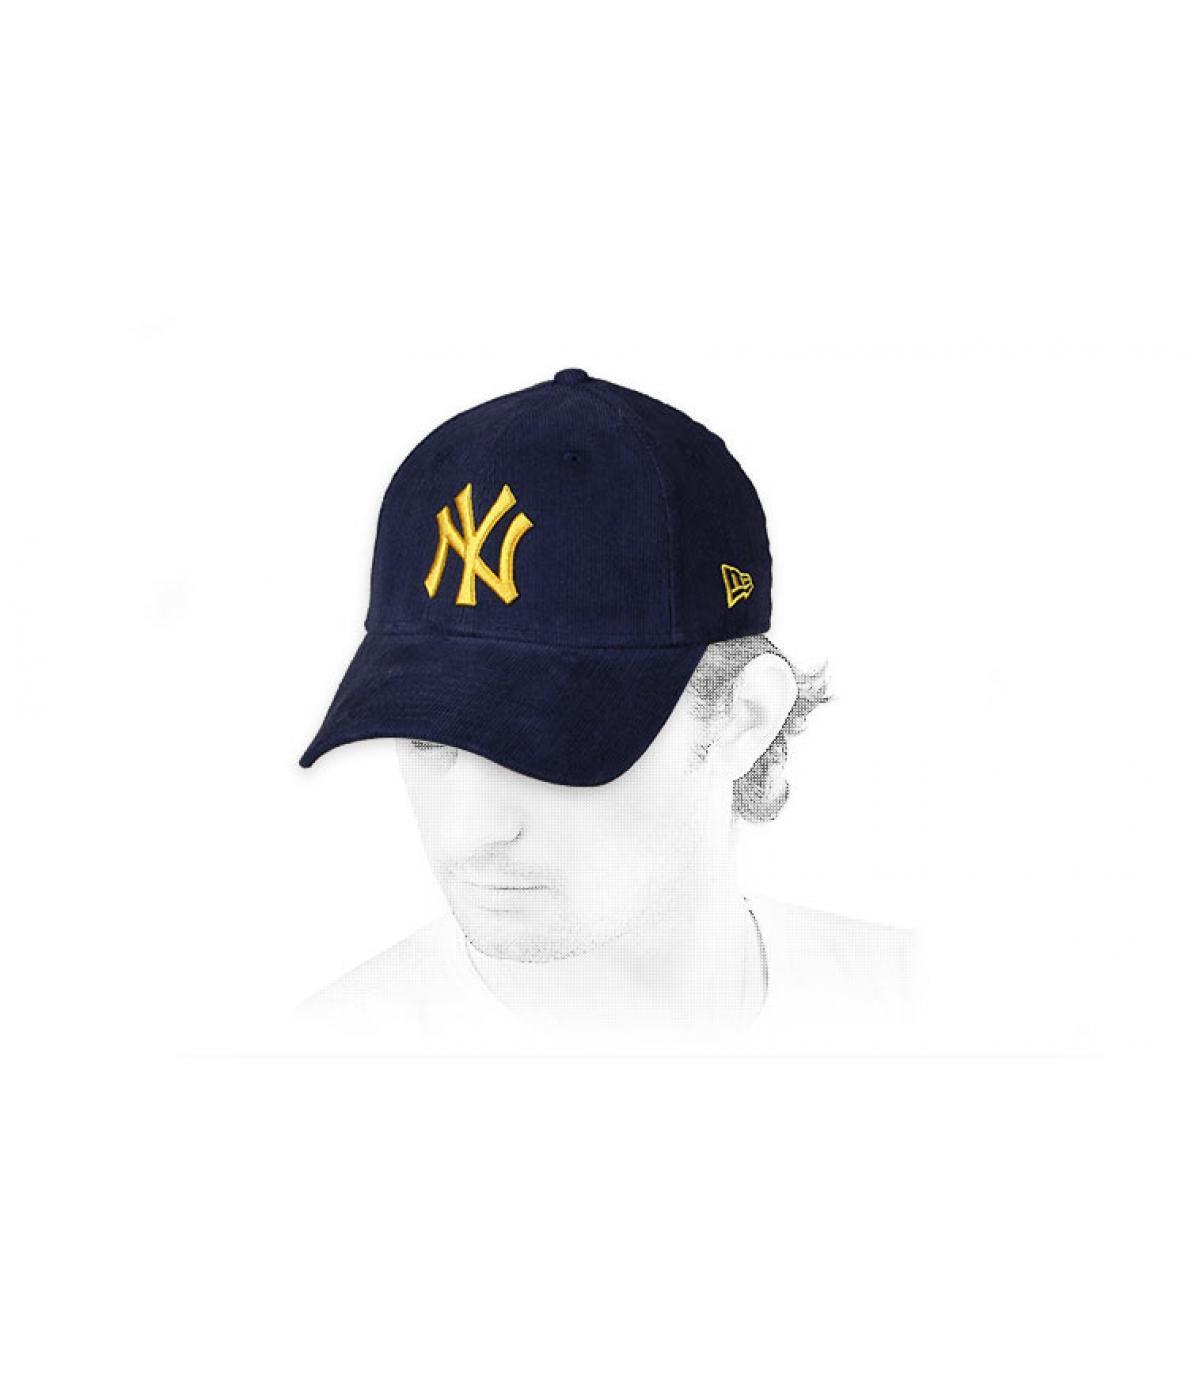 casquette NY velours bleu jaune